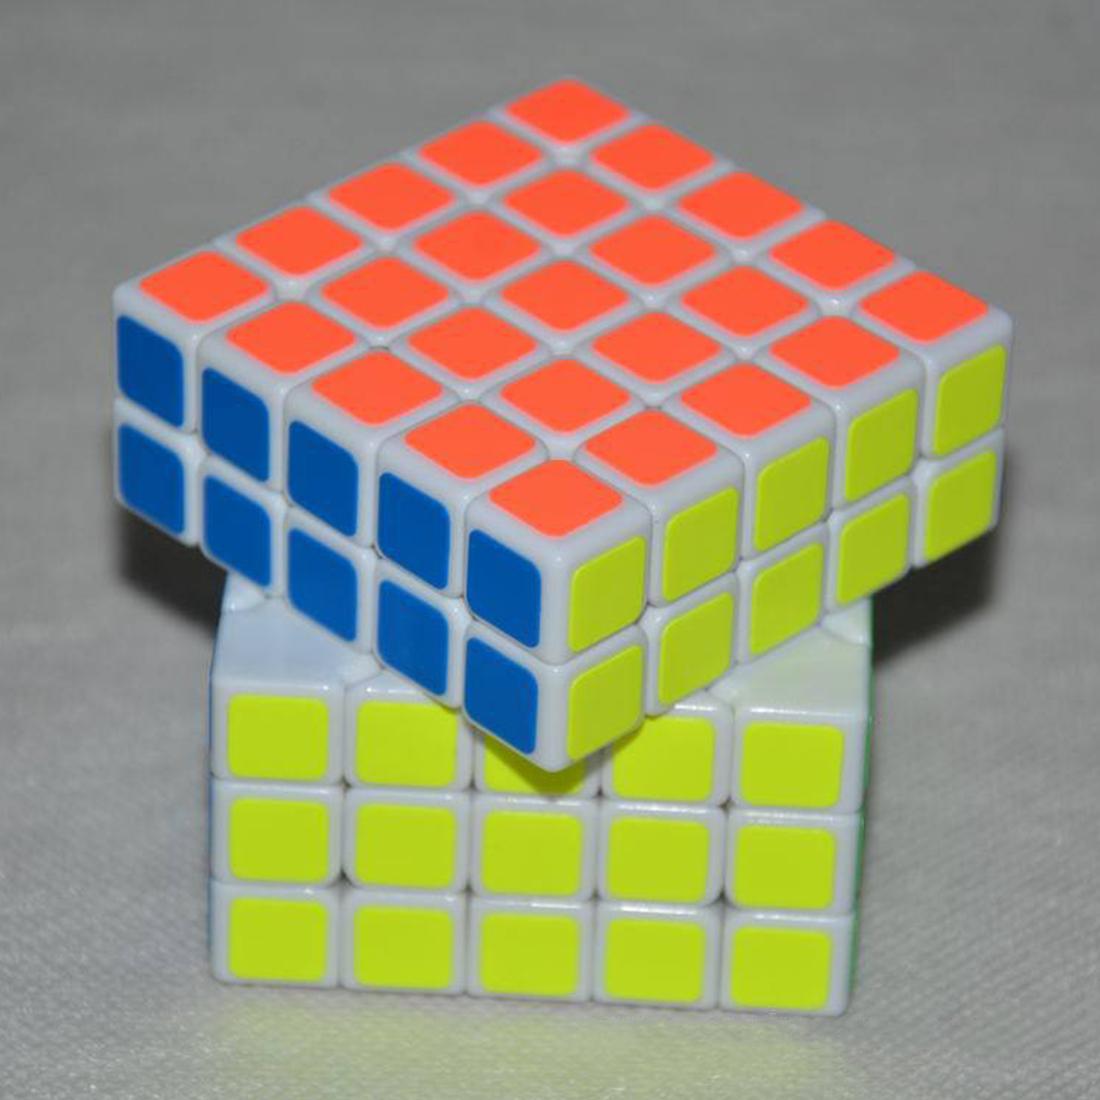 3224-326b7628d58a529948c06eed6e07f75a.jpg